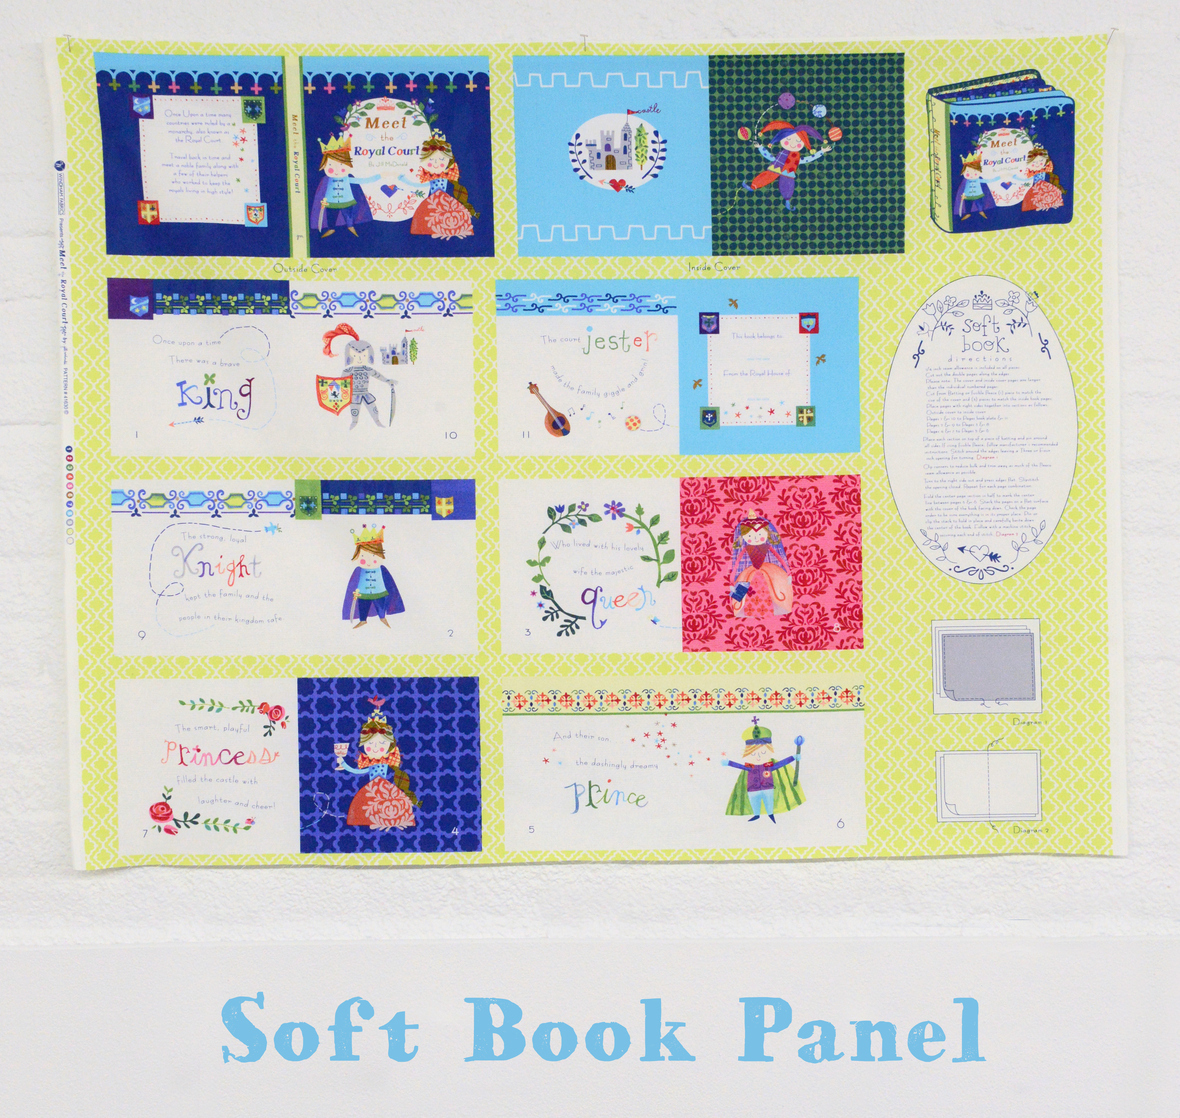 Book Panel 2